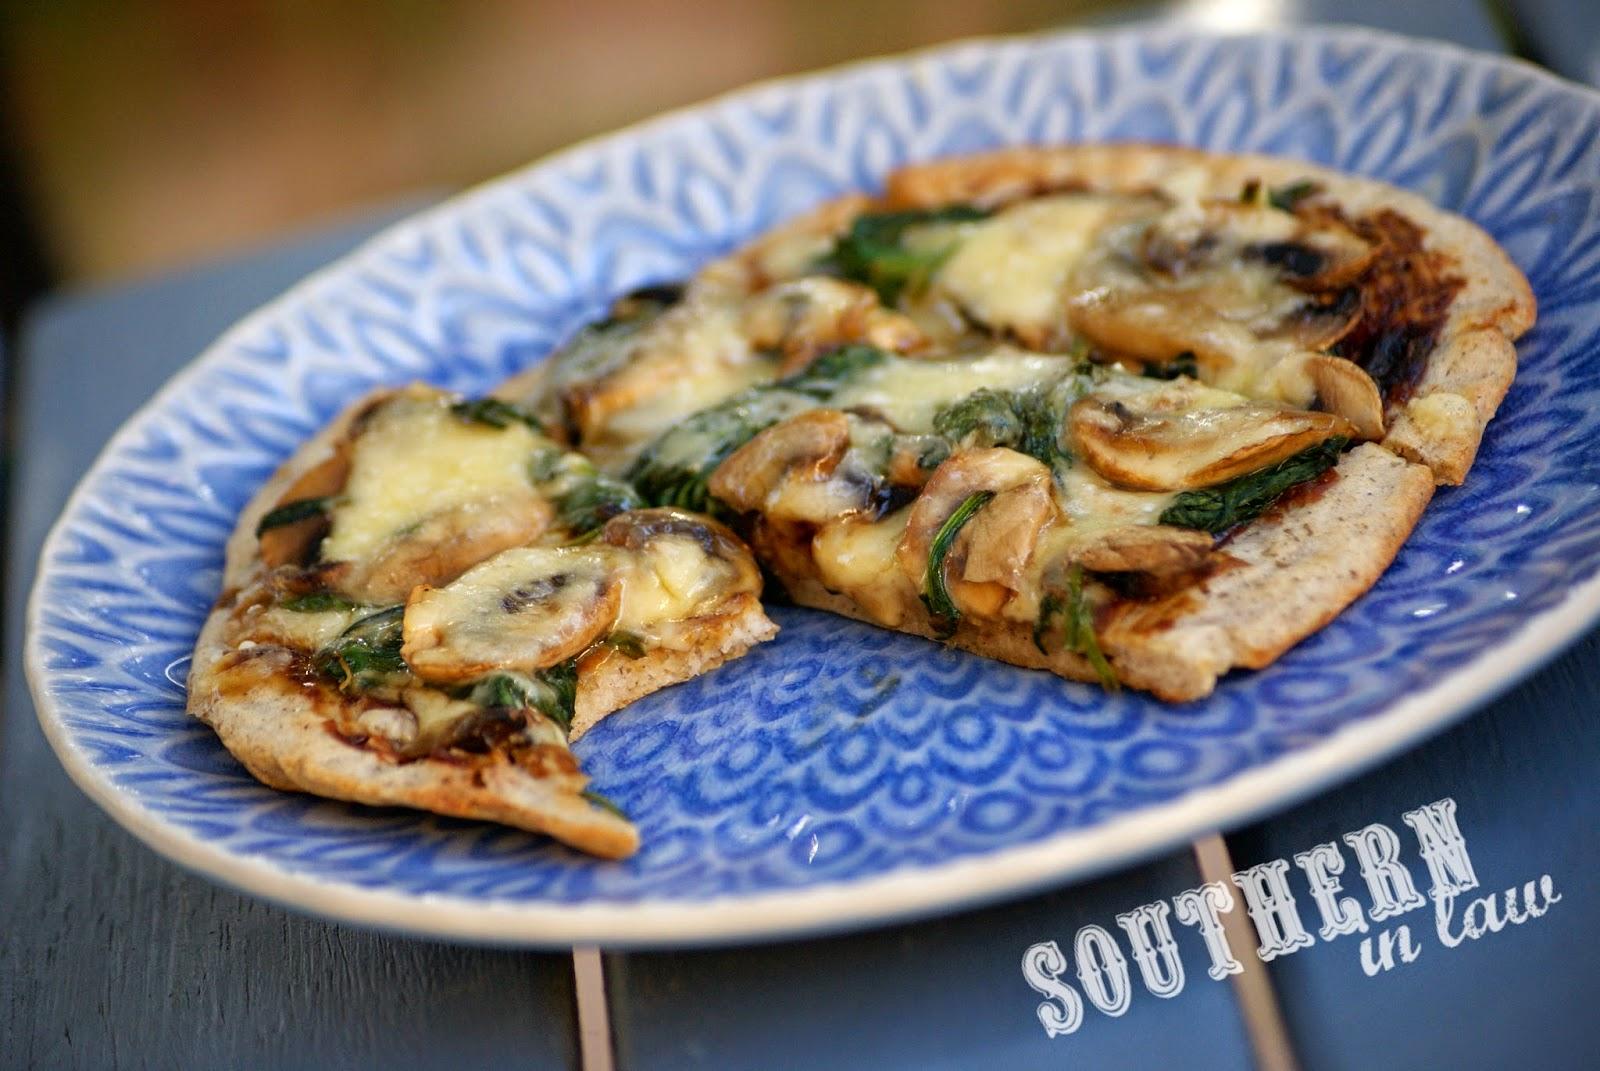 Healthy Vegemite Pizza Flatbread Recipe - gluten free, low fat, sugar free, vegan, egg free, dairy free